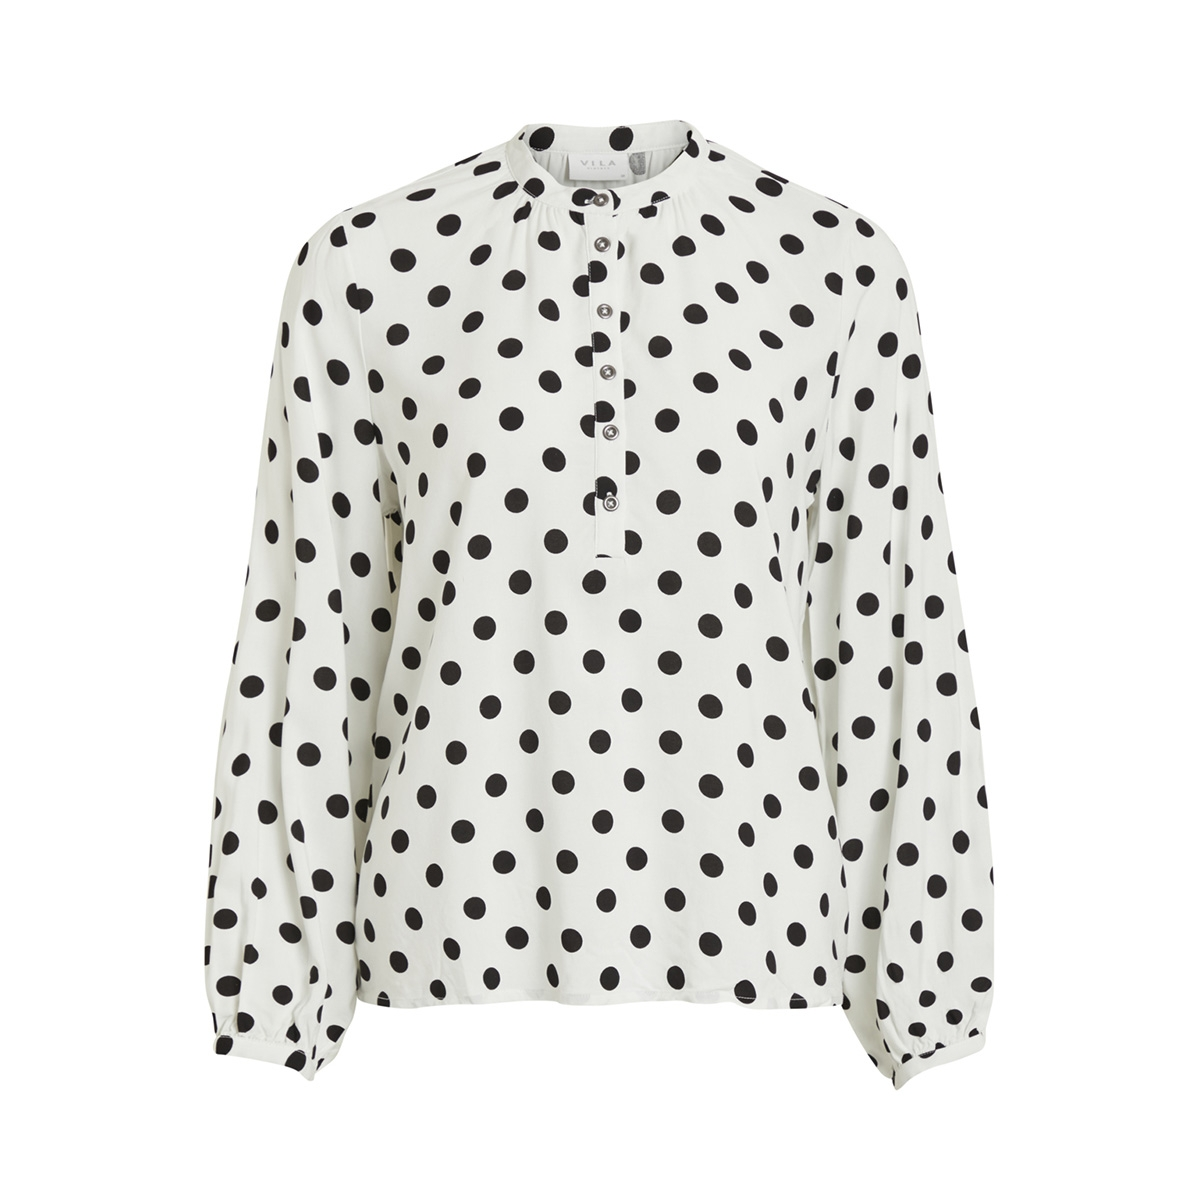 vidotla l/s top 14052802 vila blouse cloud dancer/black dots